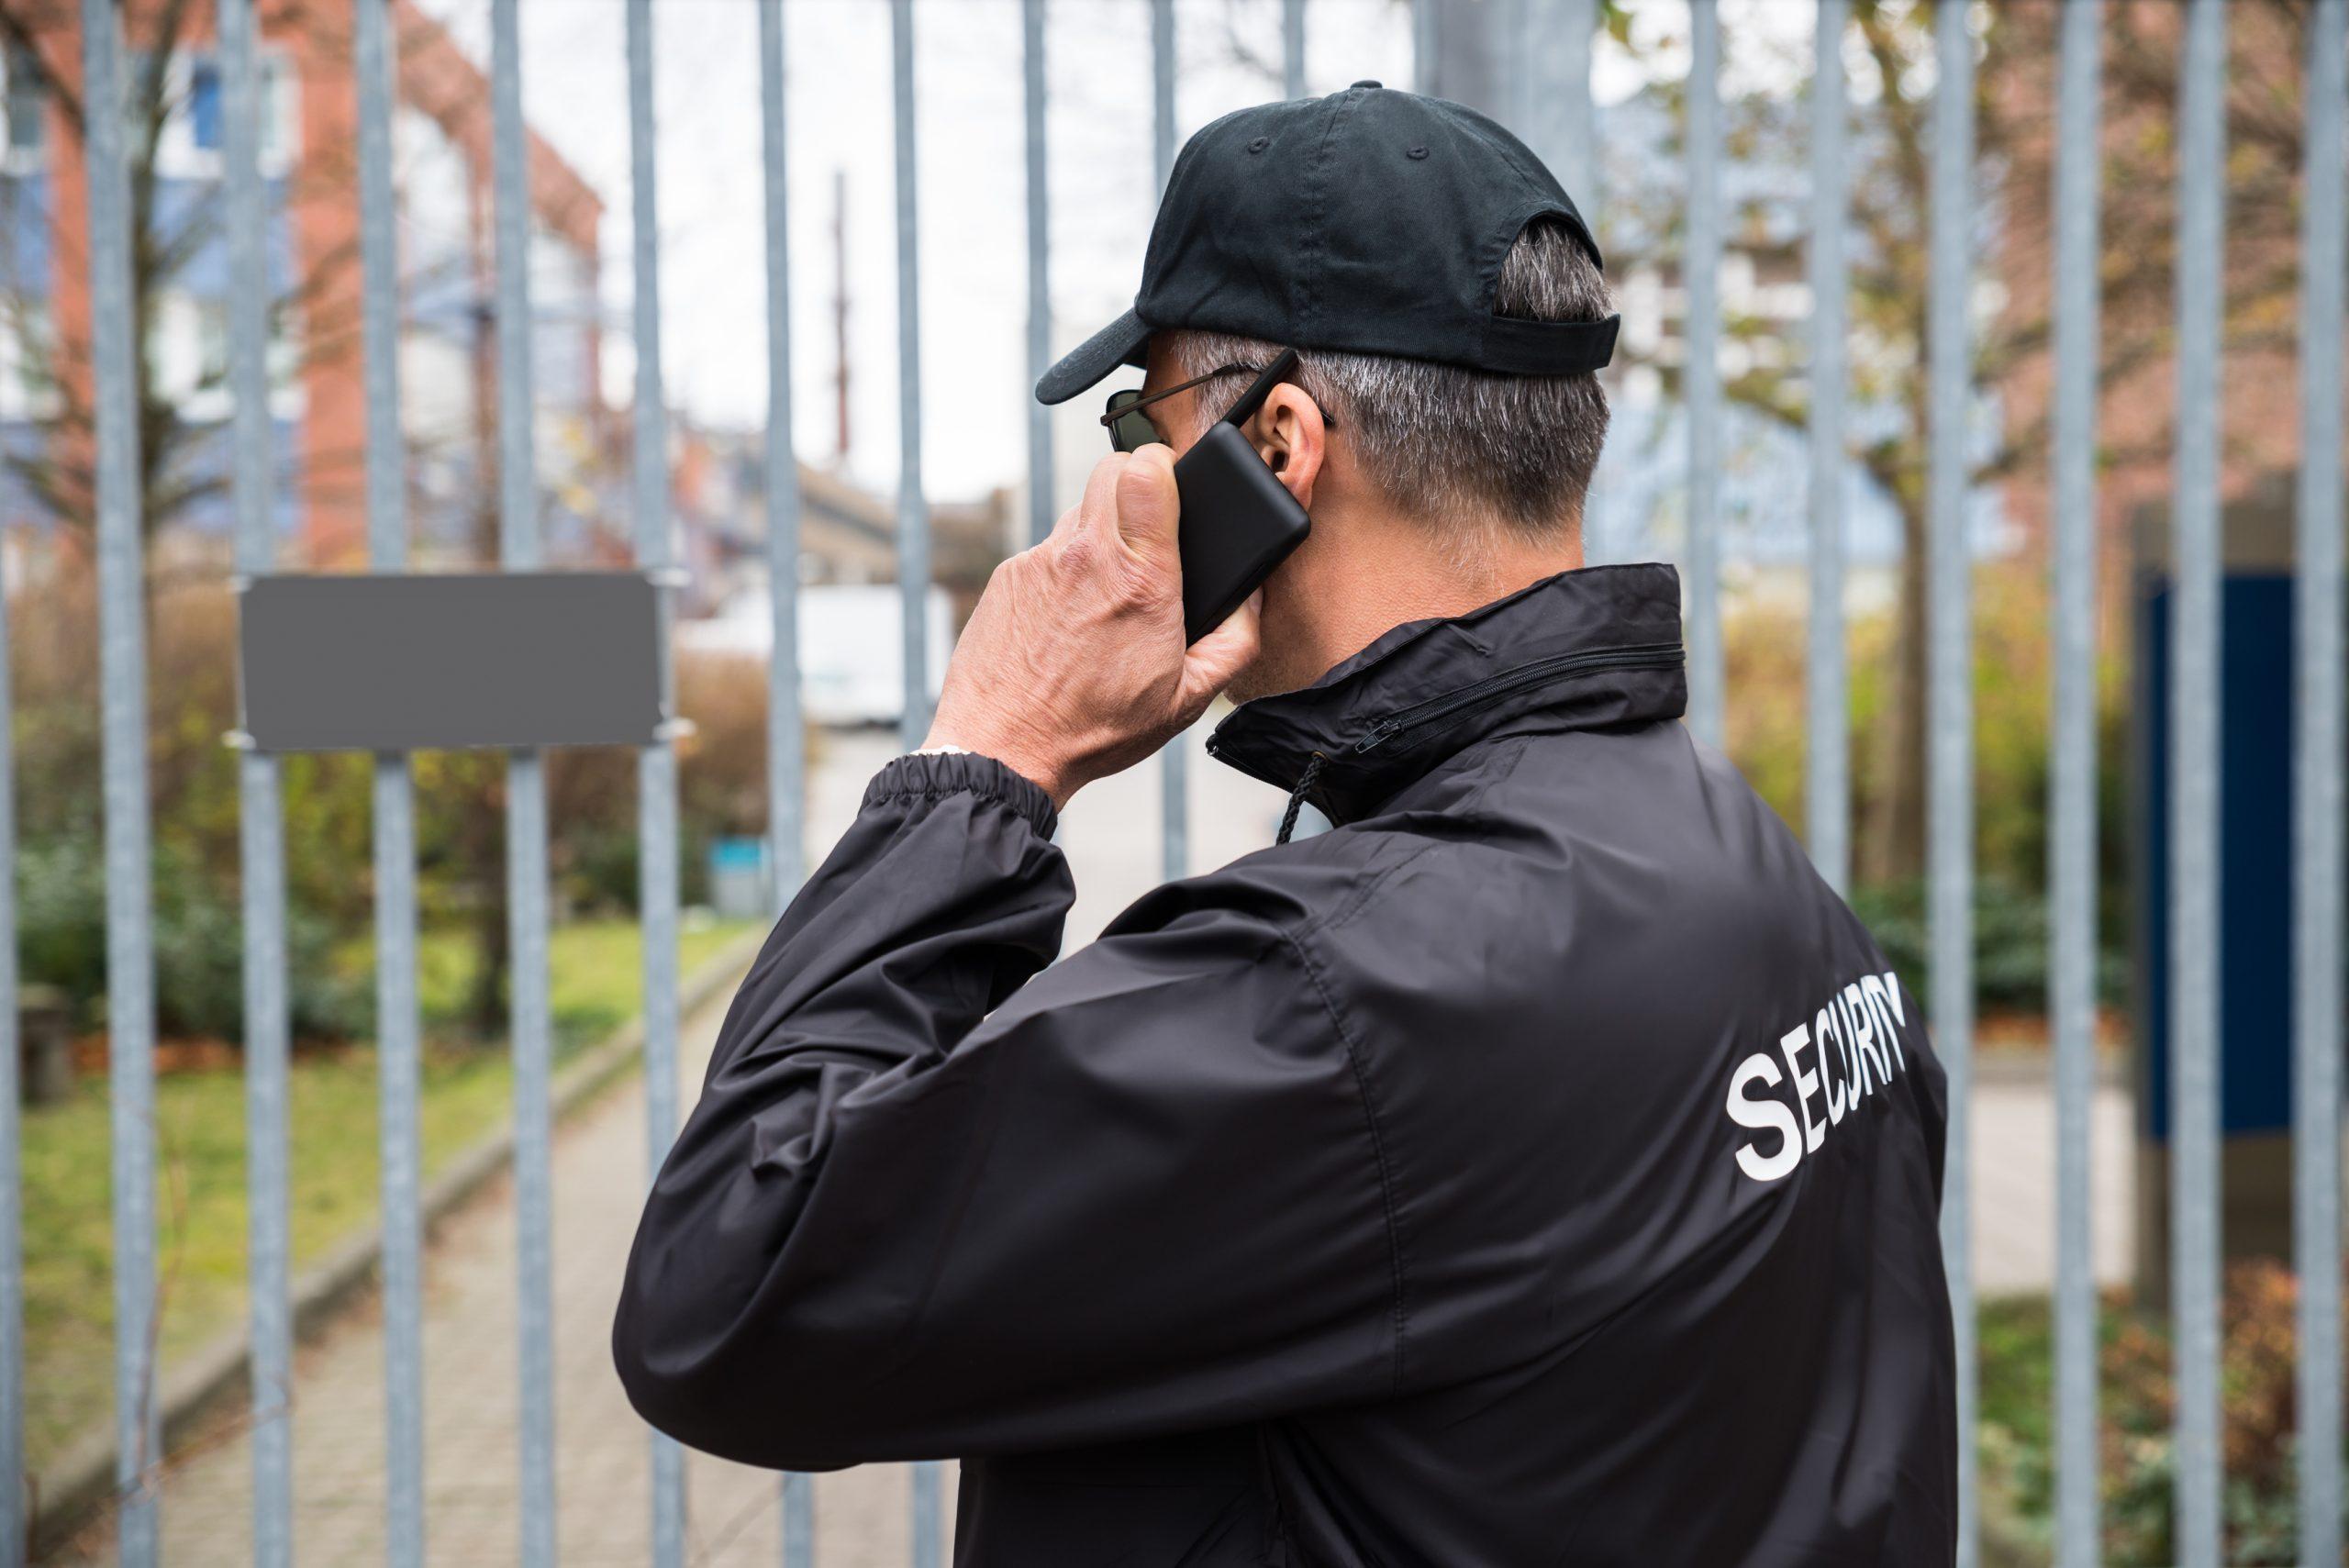 k9 security